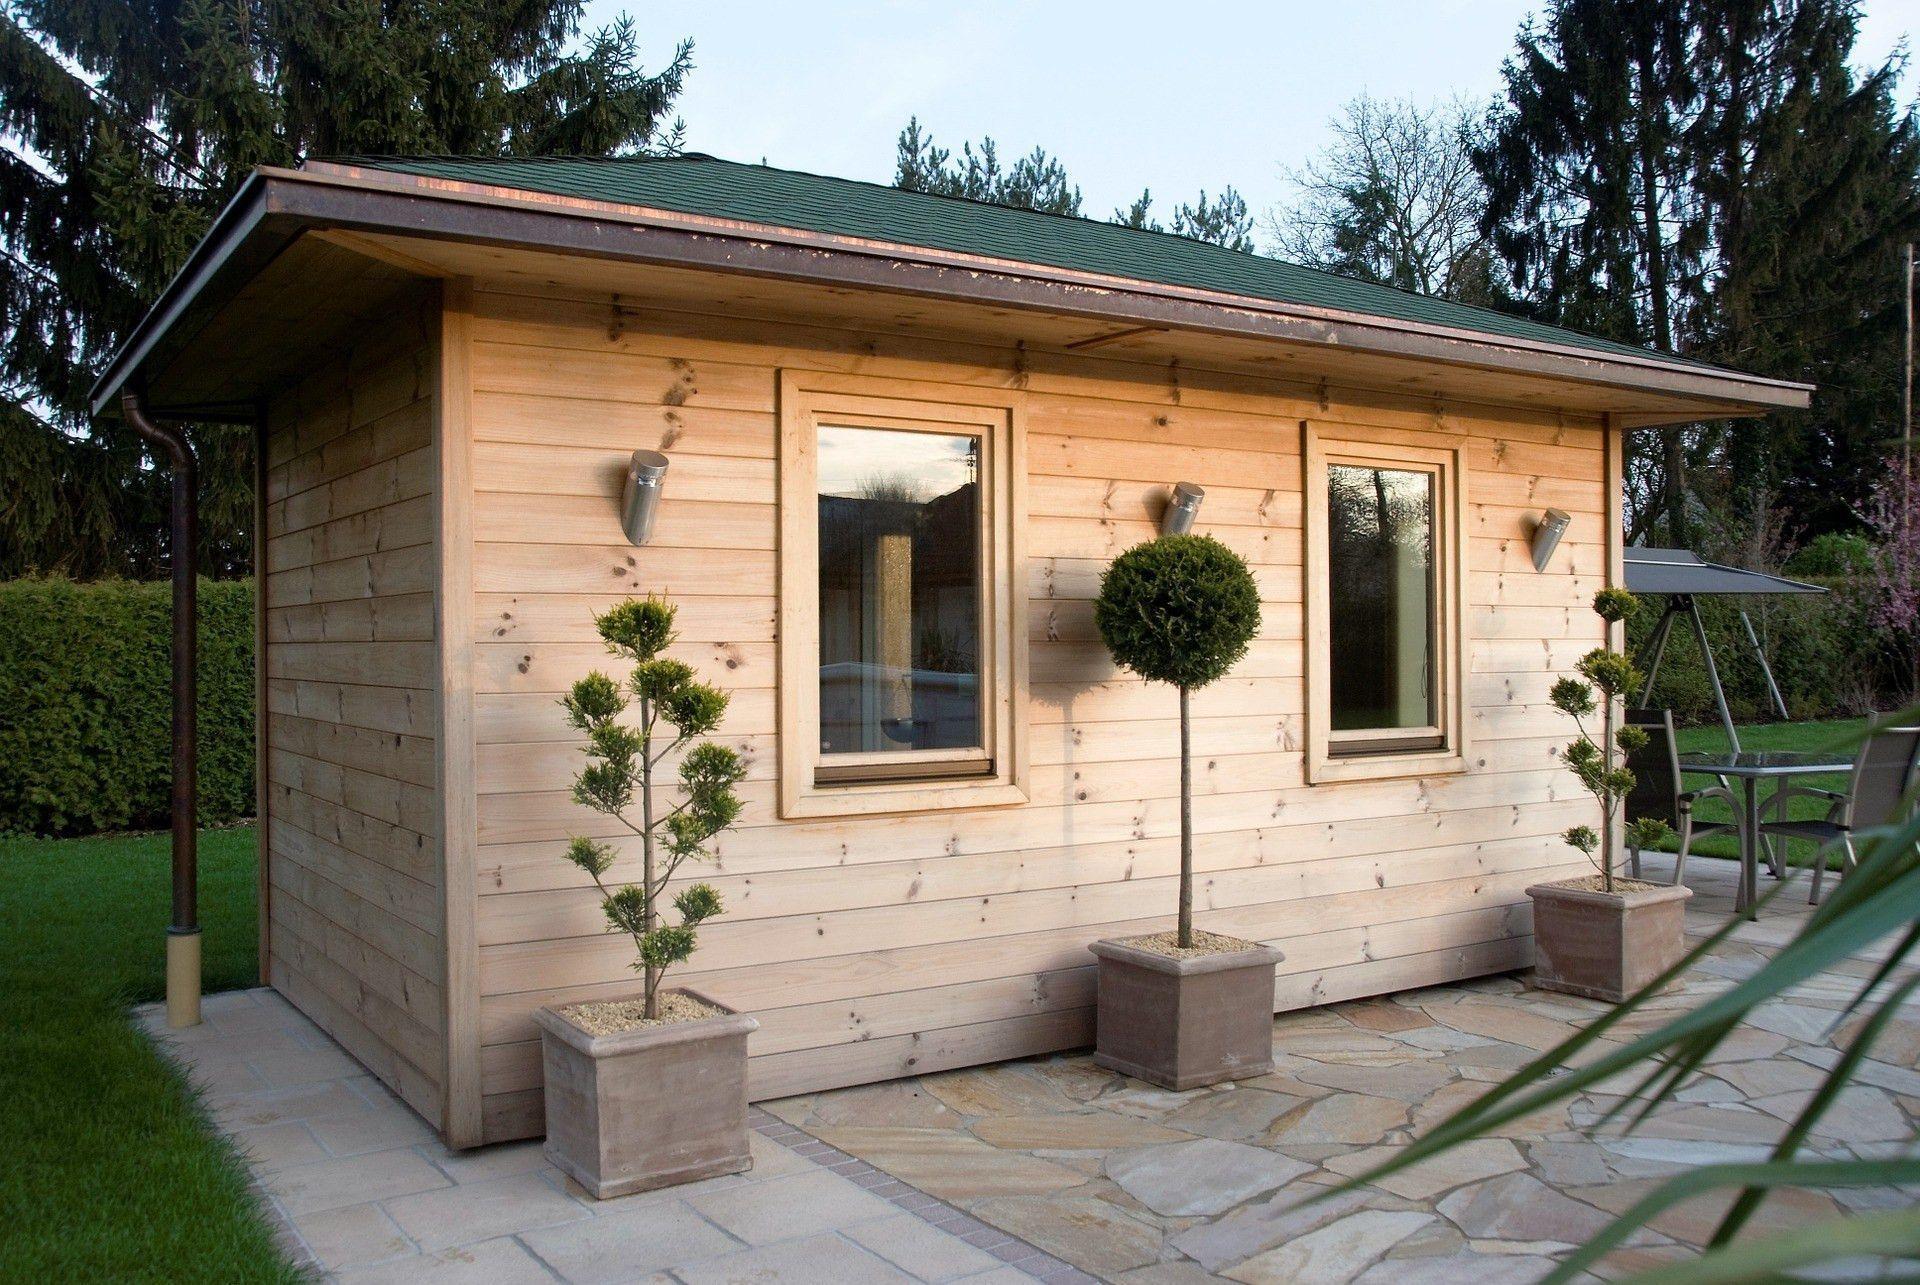 Bauen Check Fur Garten Konzept Sauna Bauen Check Fur Garten Konzept Sauna In 2020 Building A Shed Barn Style Shed Diy Shed Plans